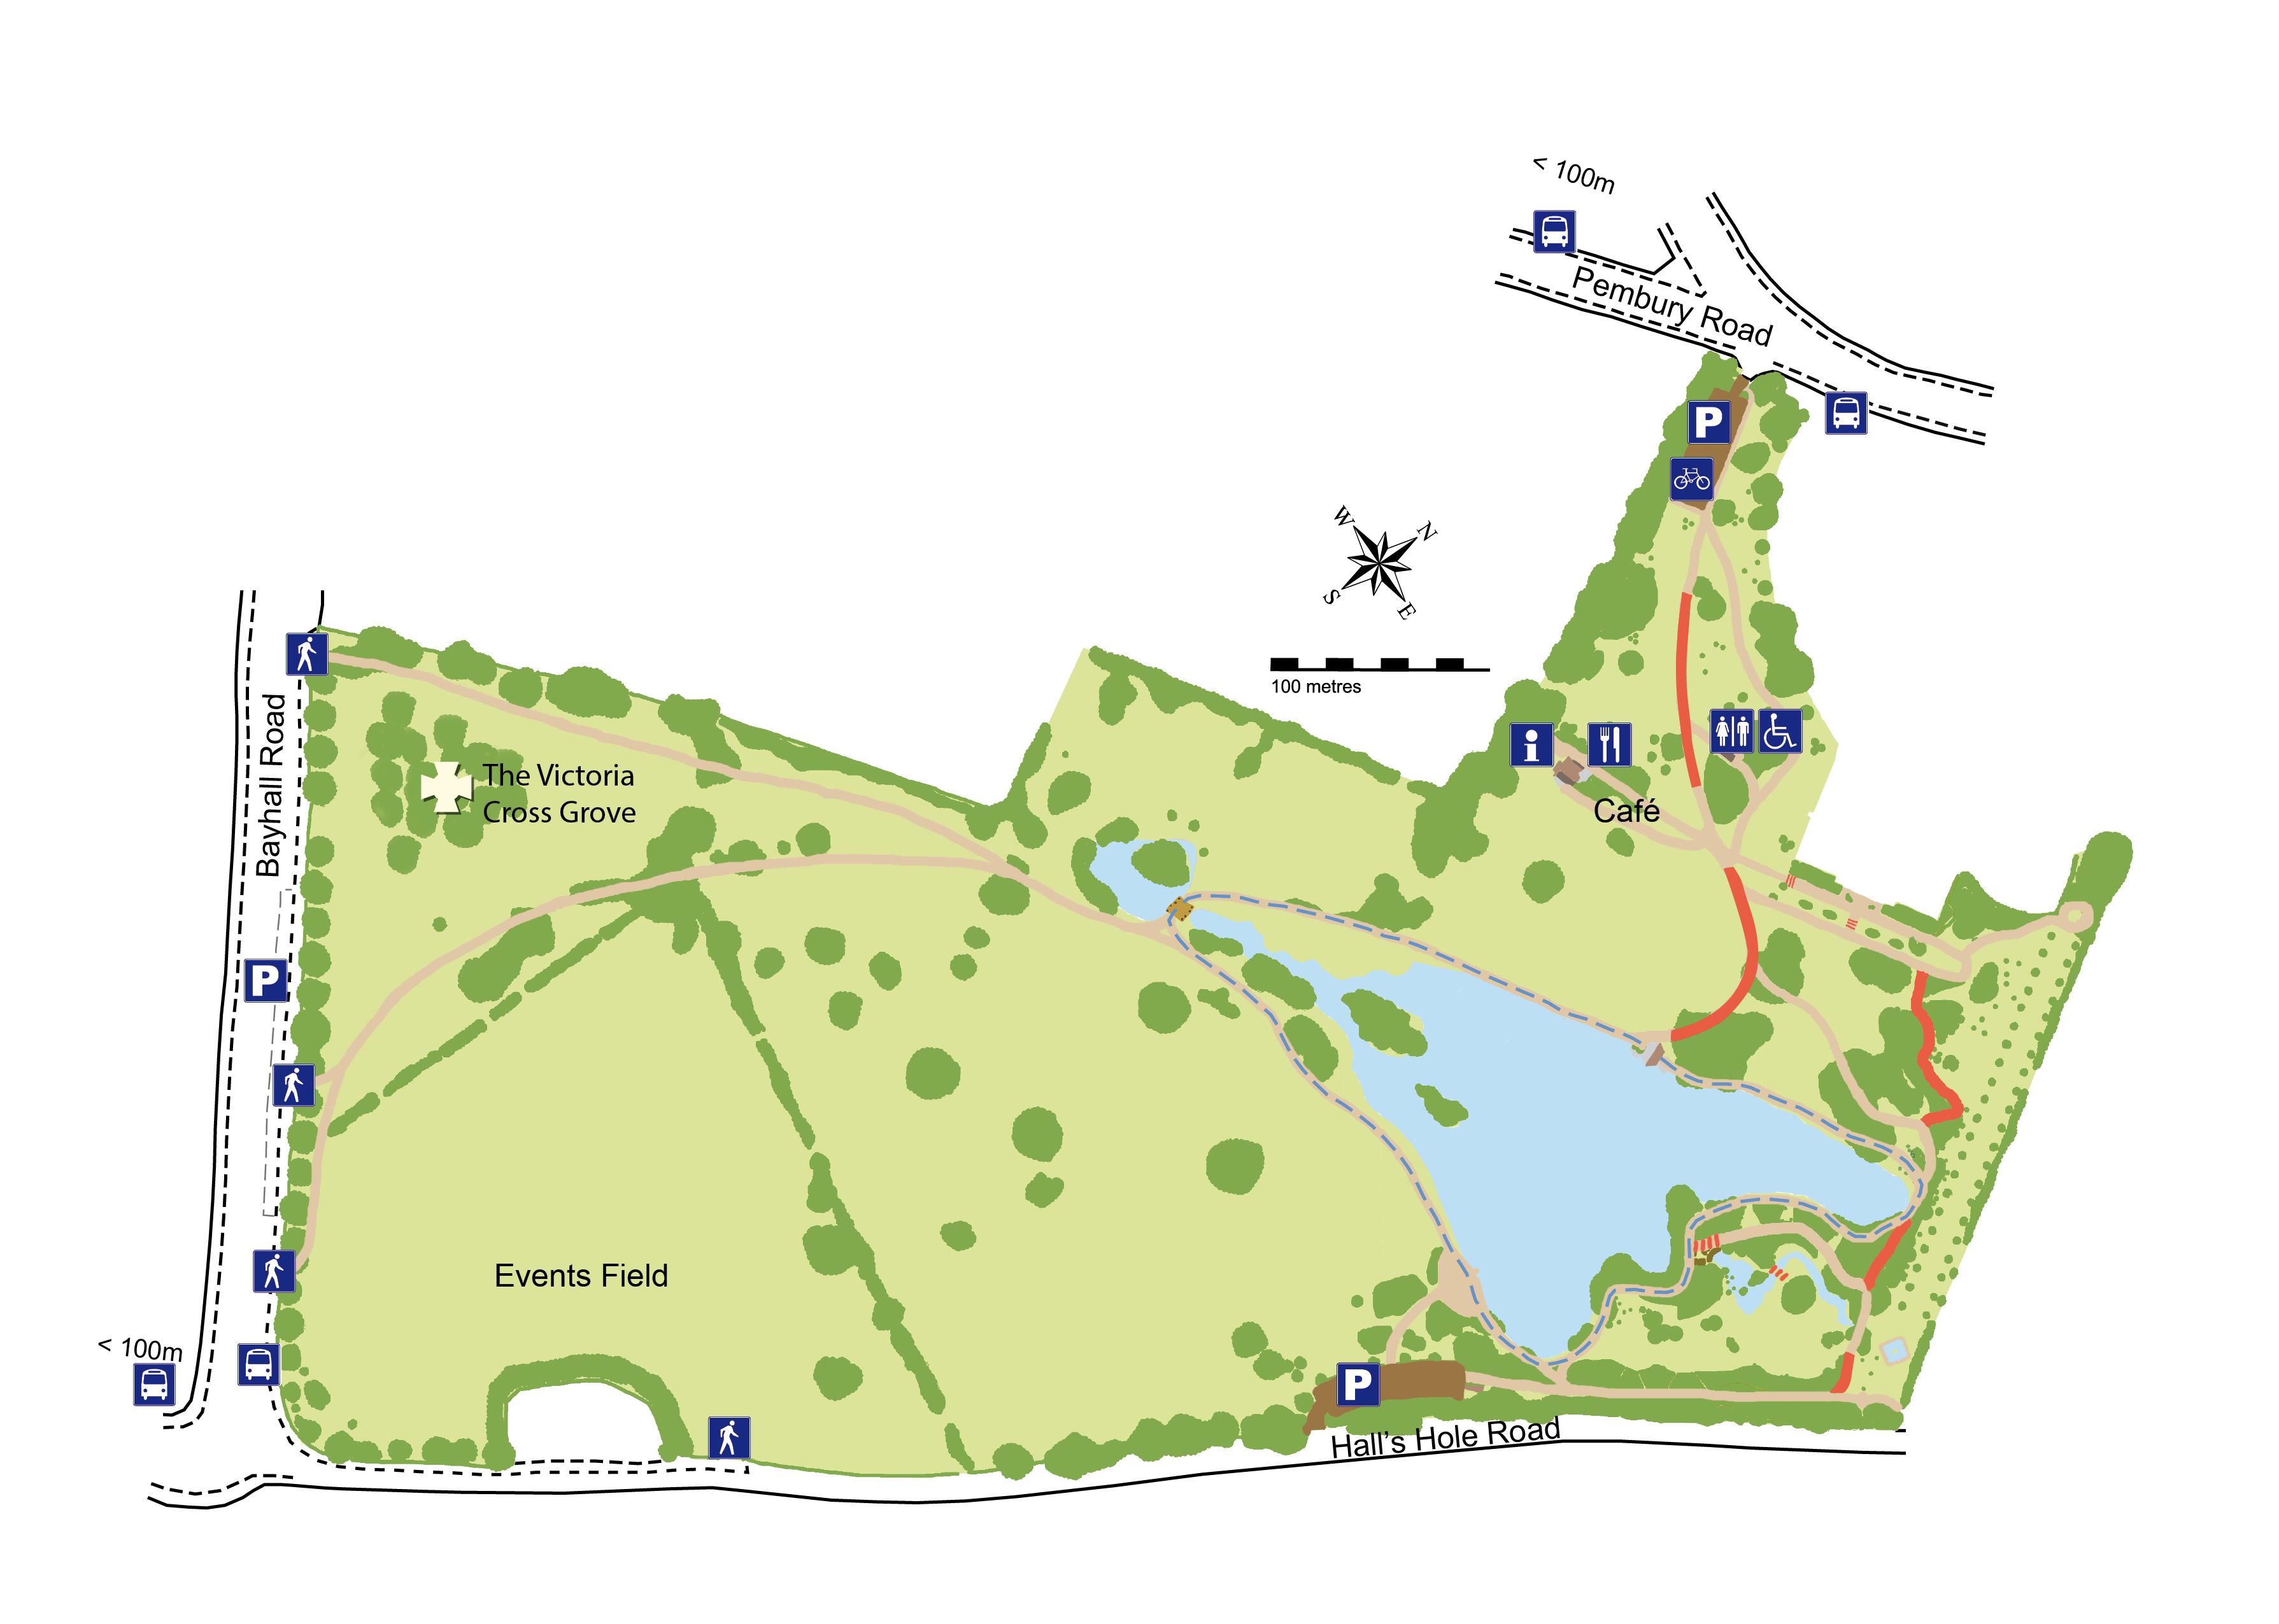 Victoria Cross Grove location map